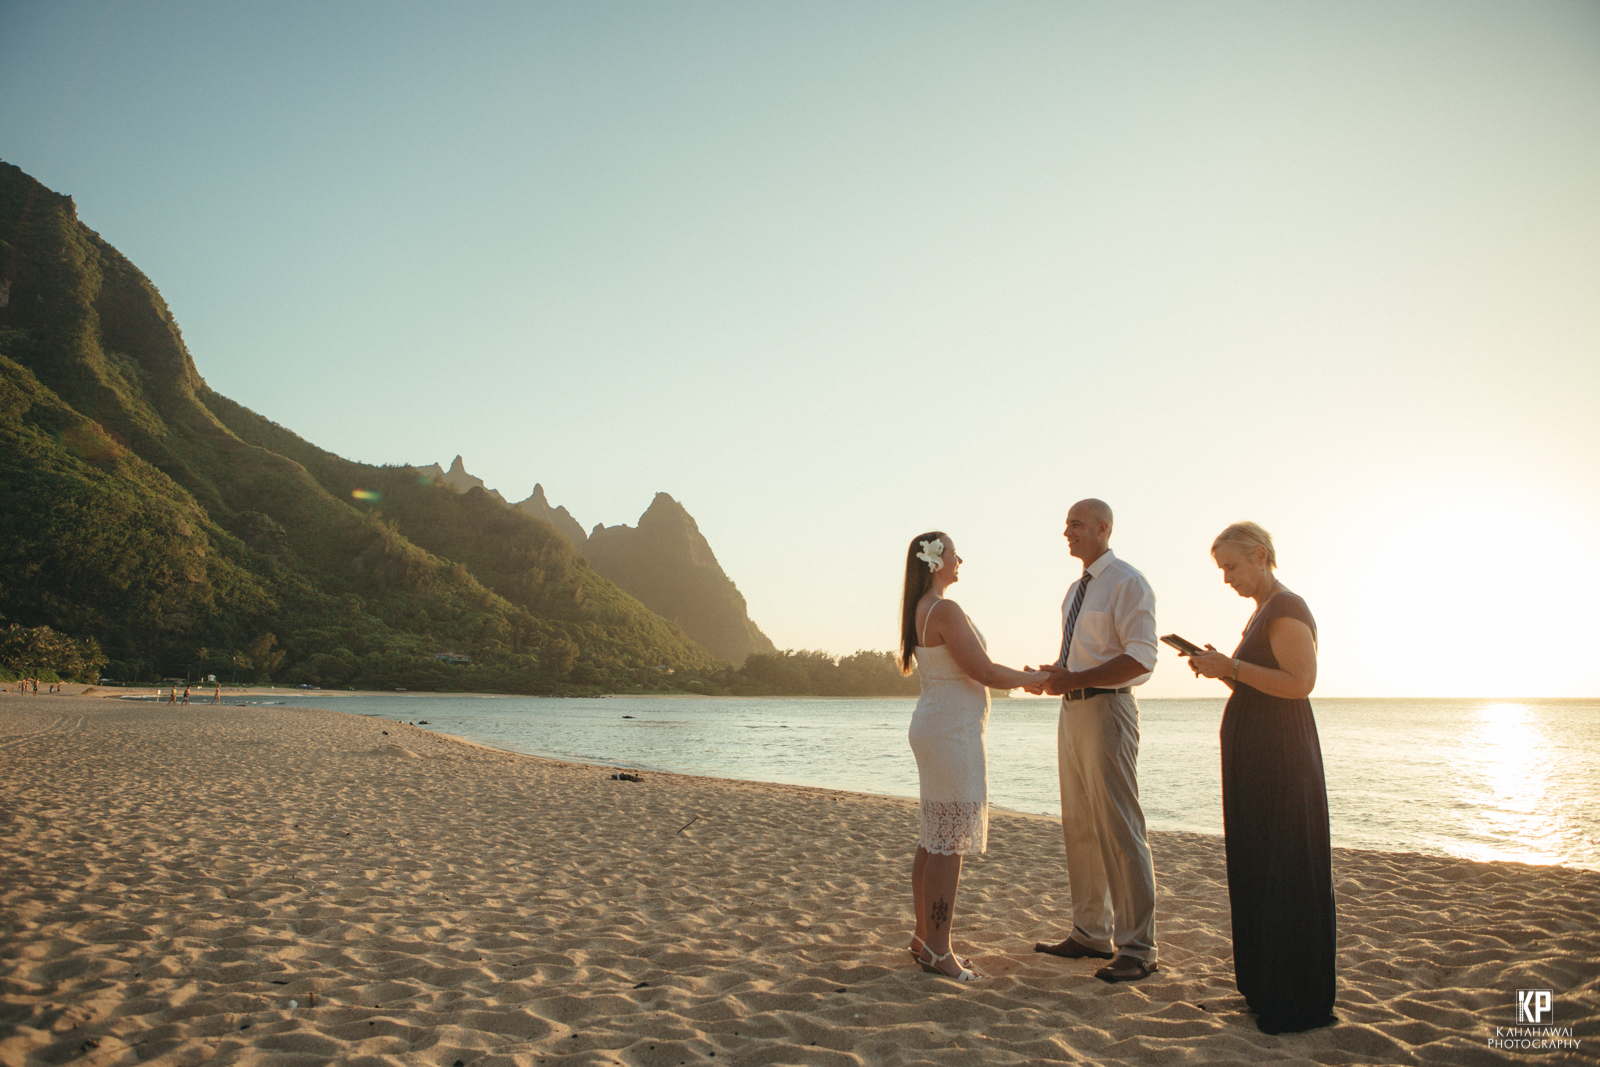 Kauai Wedding Elopement on Kauai - alone on the beach with a professional Kauai Wedding Photographer